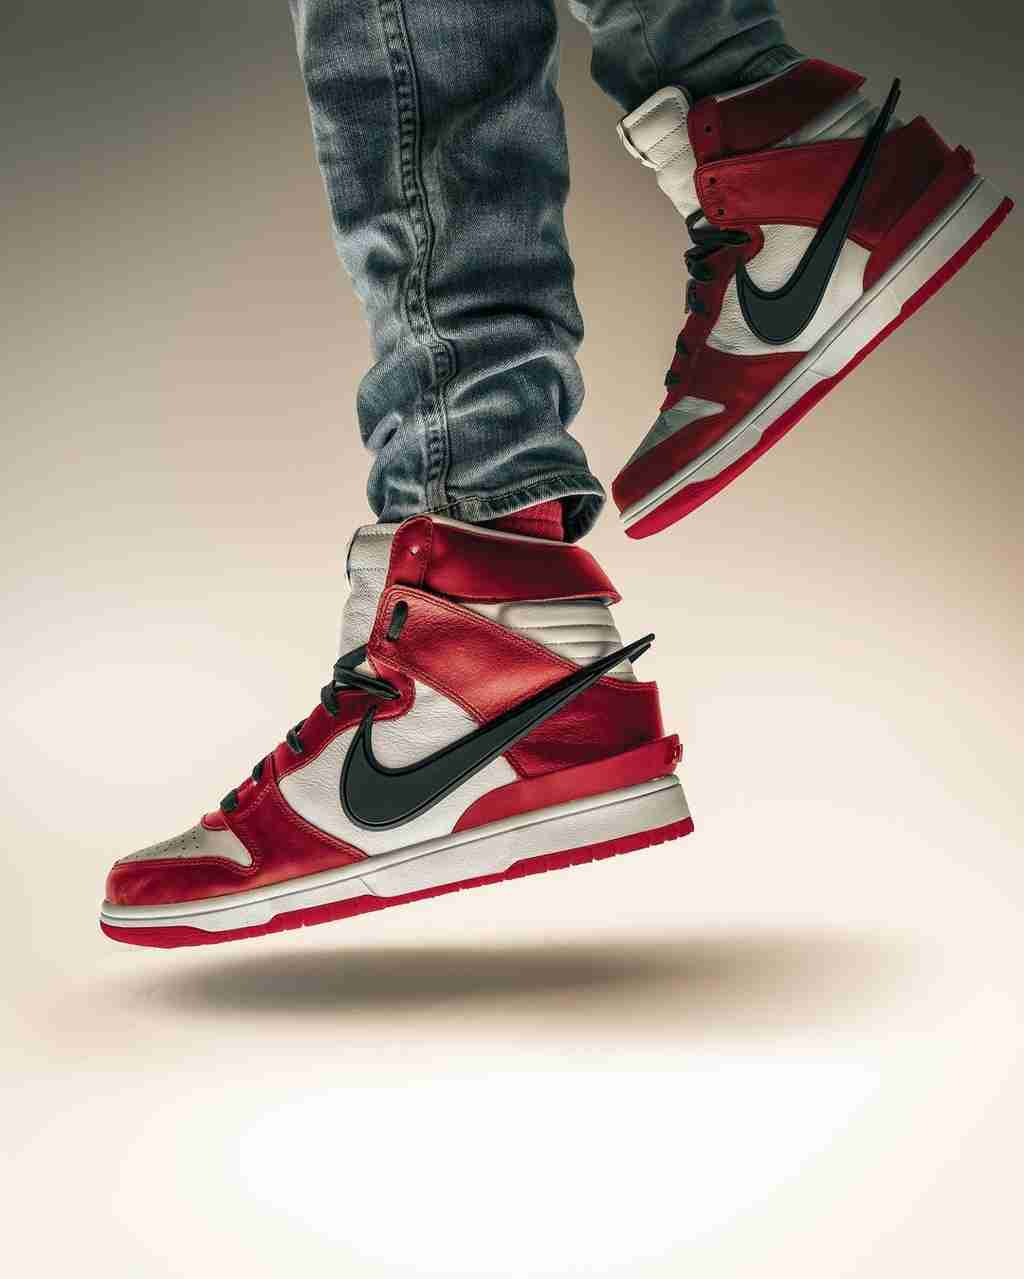 AMBUSH x Nike Dunk photo by Bruce Ha